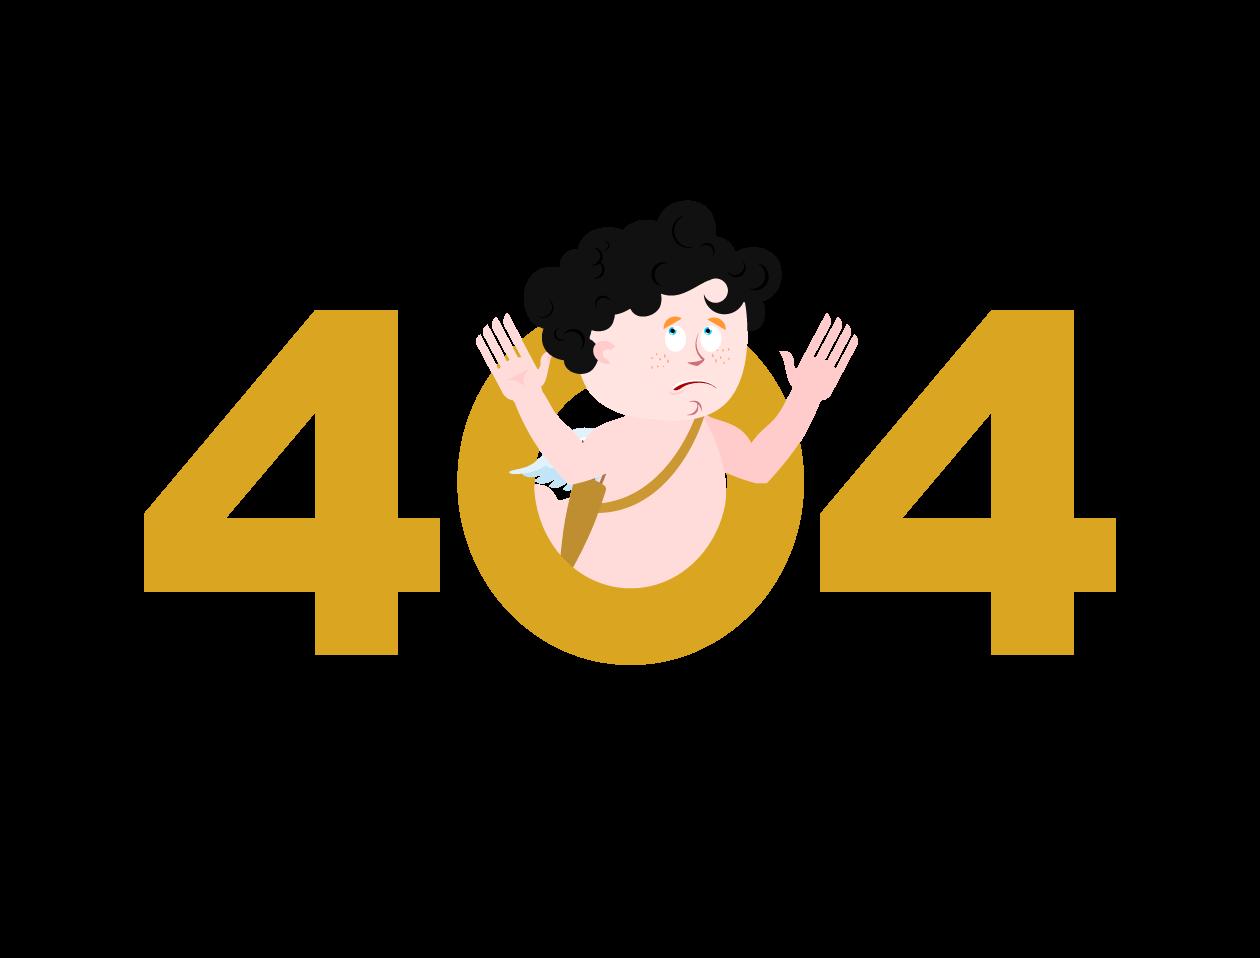 404 404